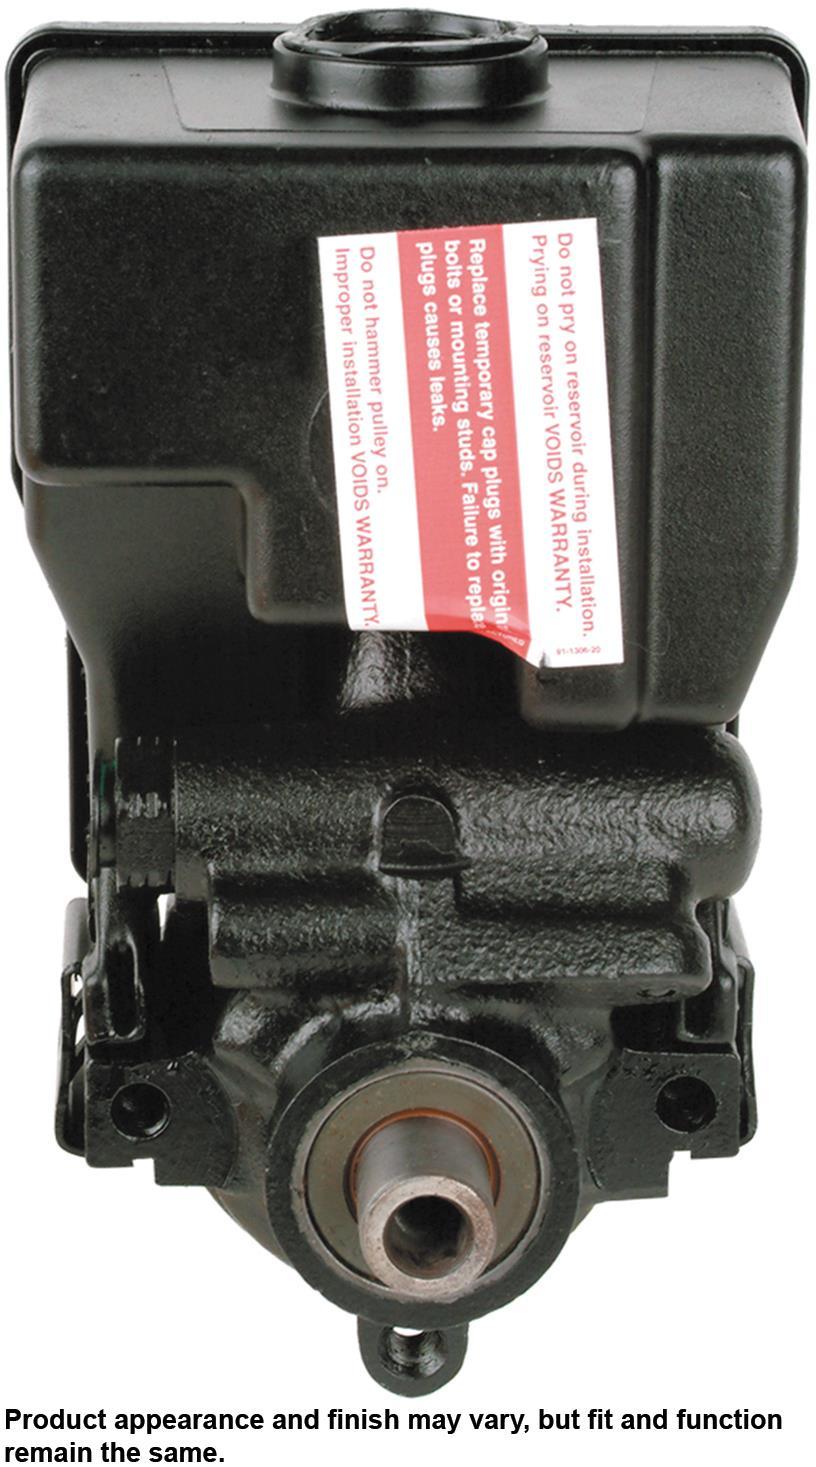 Oldsmobile Achieva Power Steering Pump From Cardone